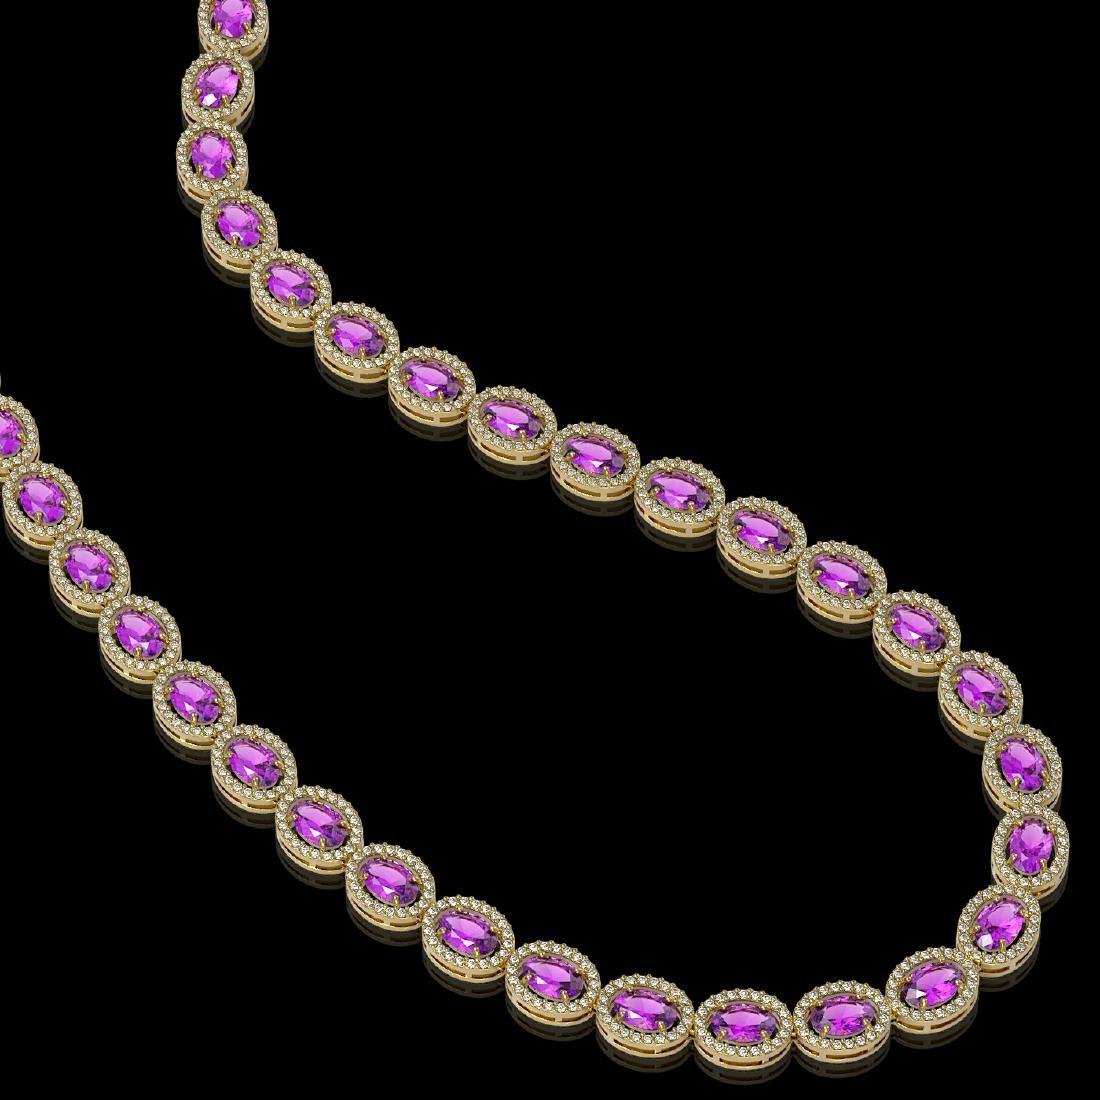 29.38 CTW Amethyst & Diamond Halo Necklace 10K Yellow - 2